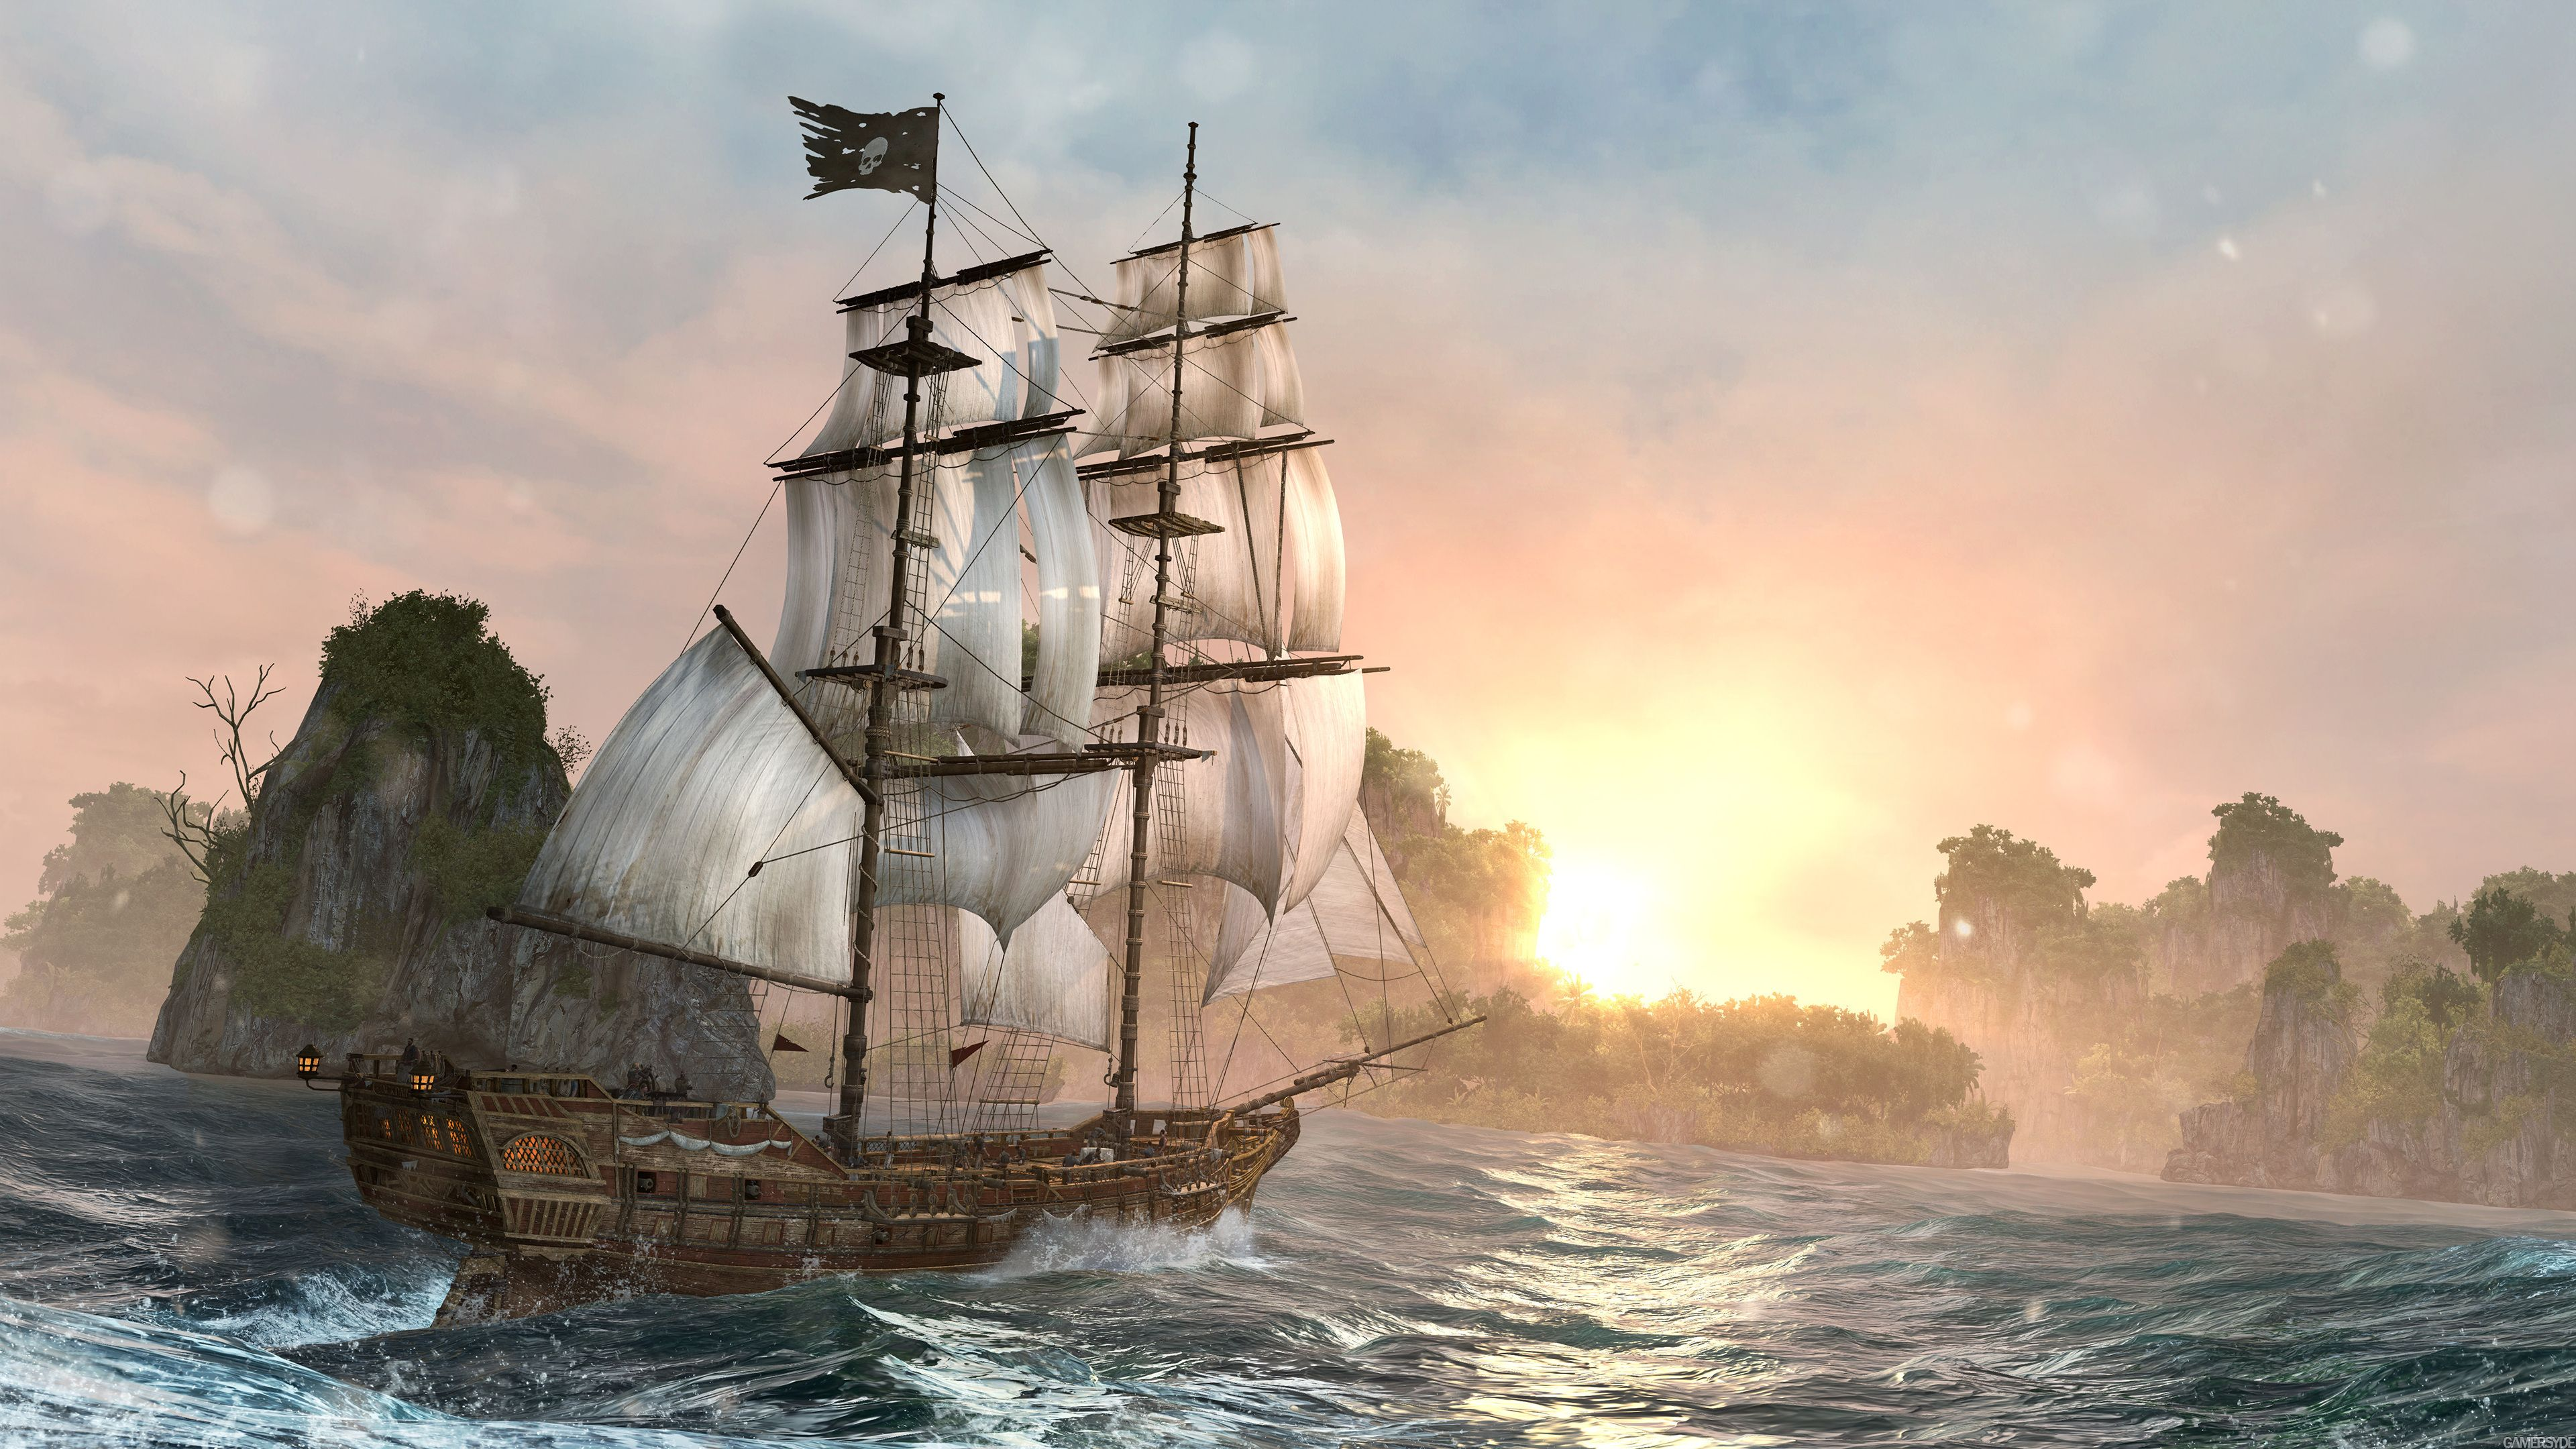 free download ship art game hd wallpaper because thedesktop